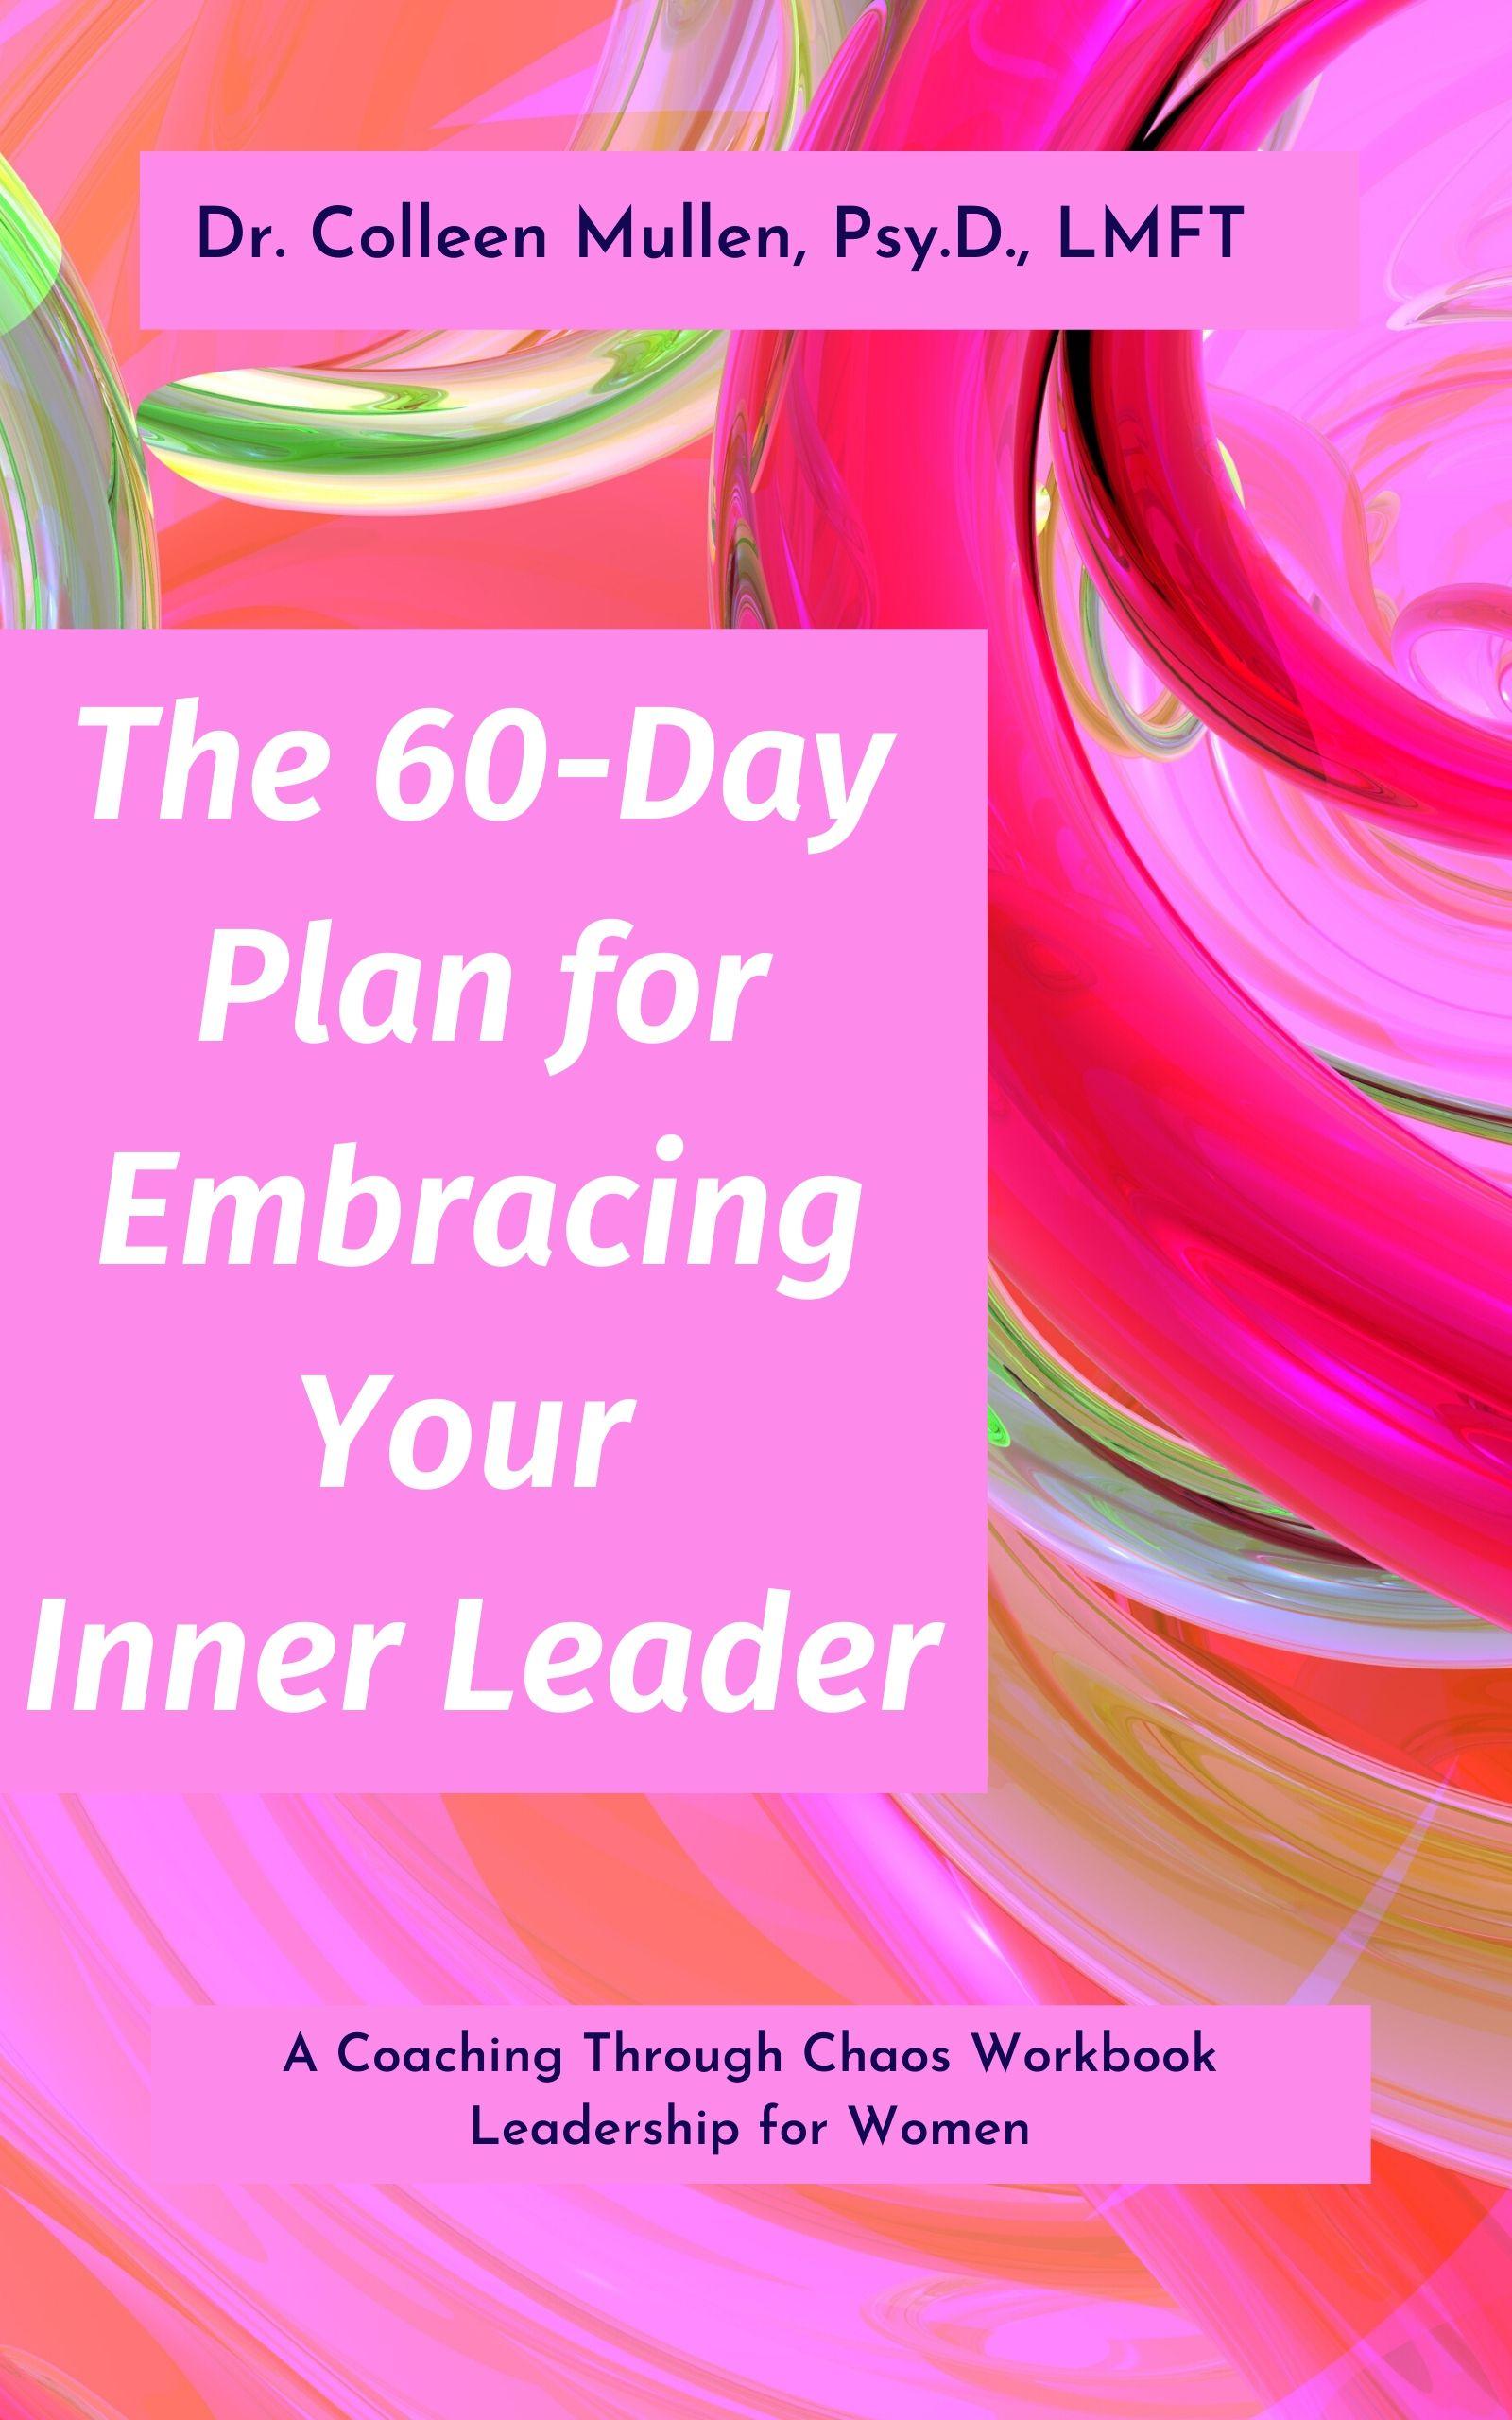 Leadership for Women - Tthe 60-day plan book cover